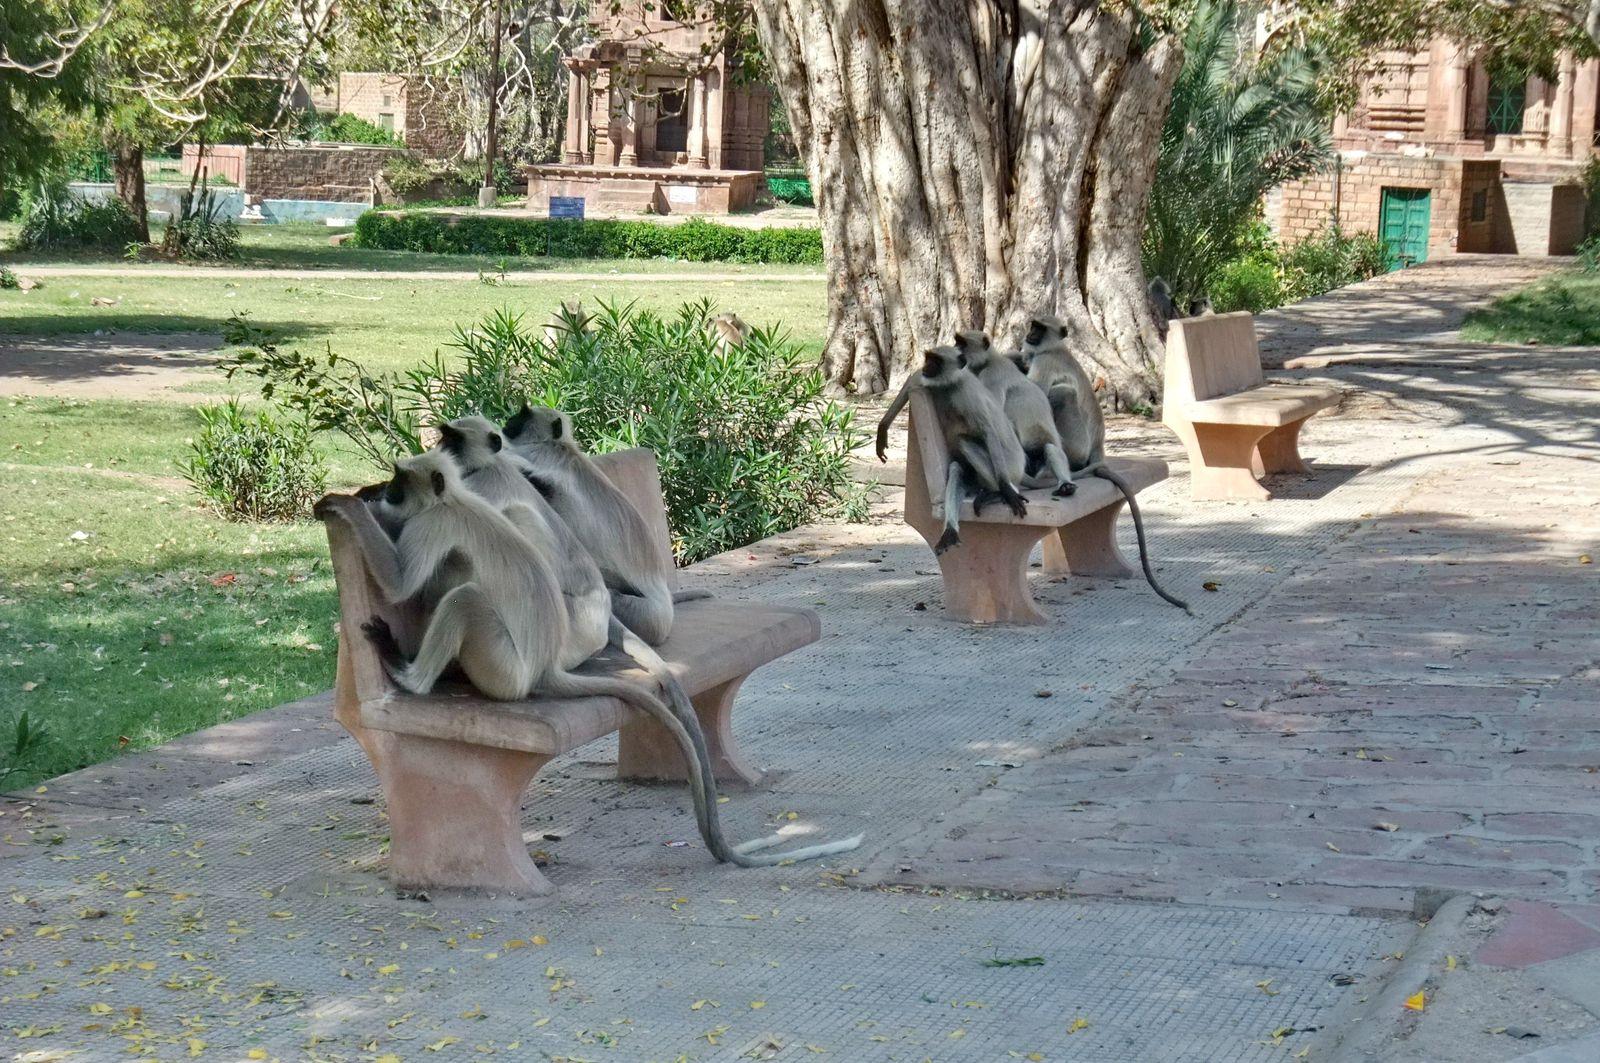 Jardin de Mandore  - Jodhpur - Inde - THE THREE WISE MONKEYS